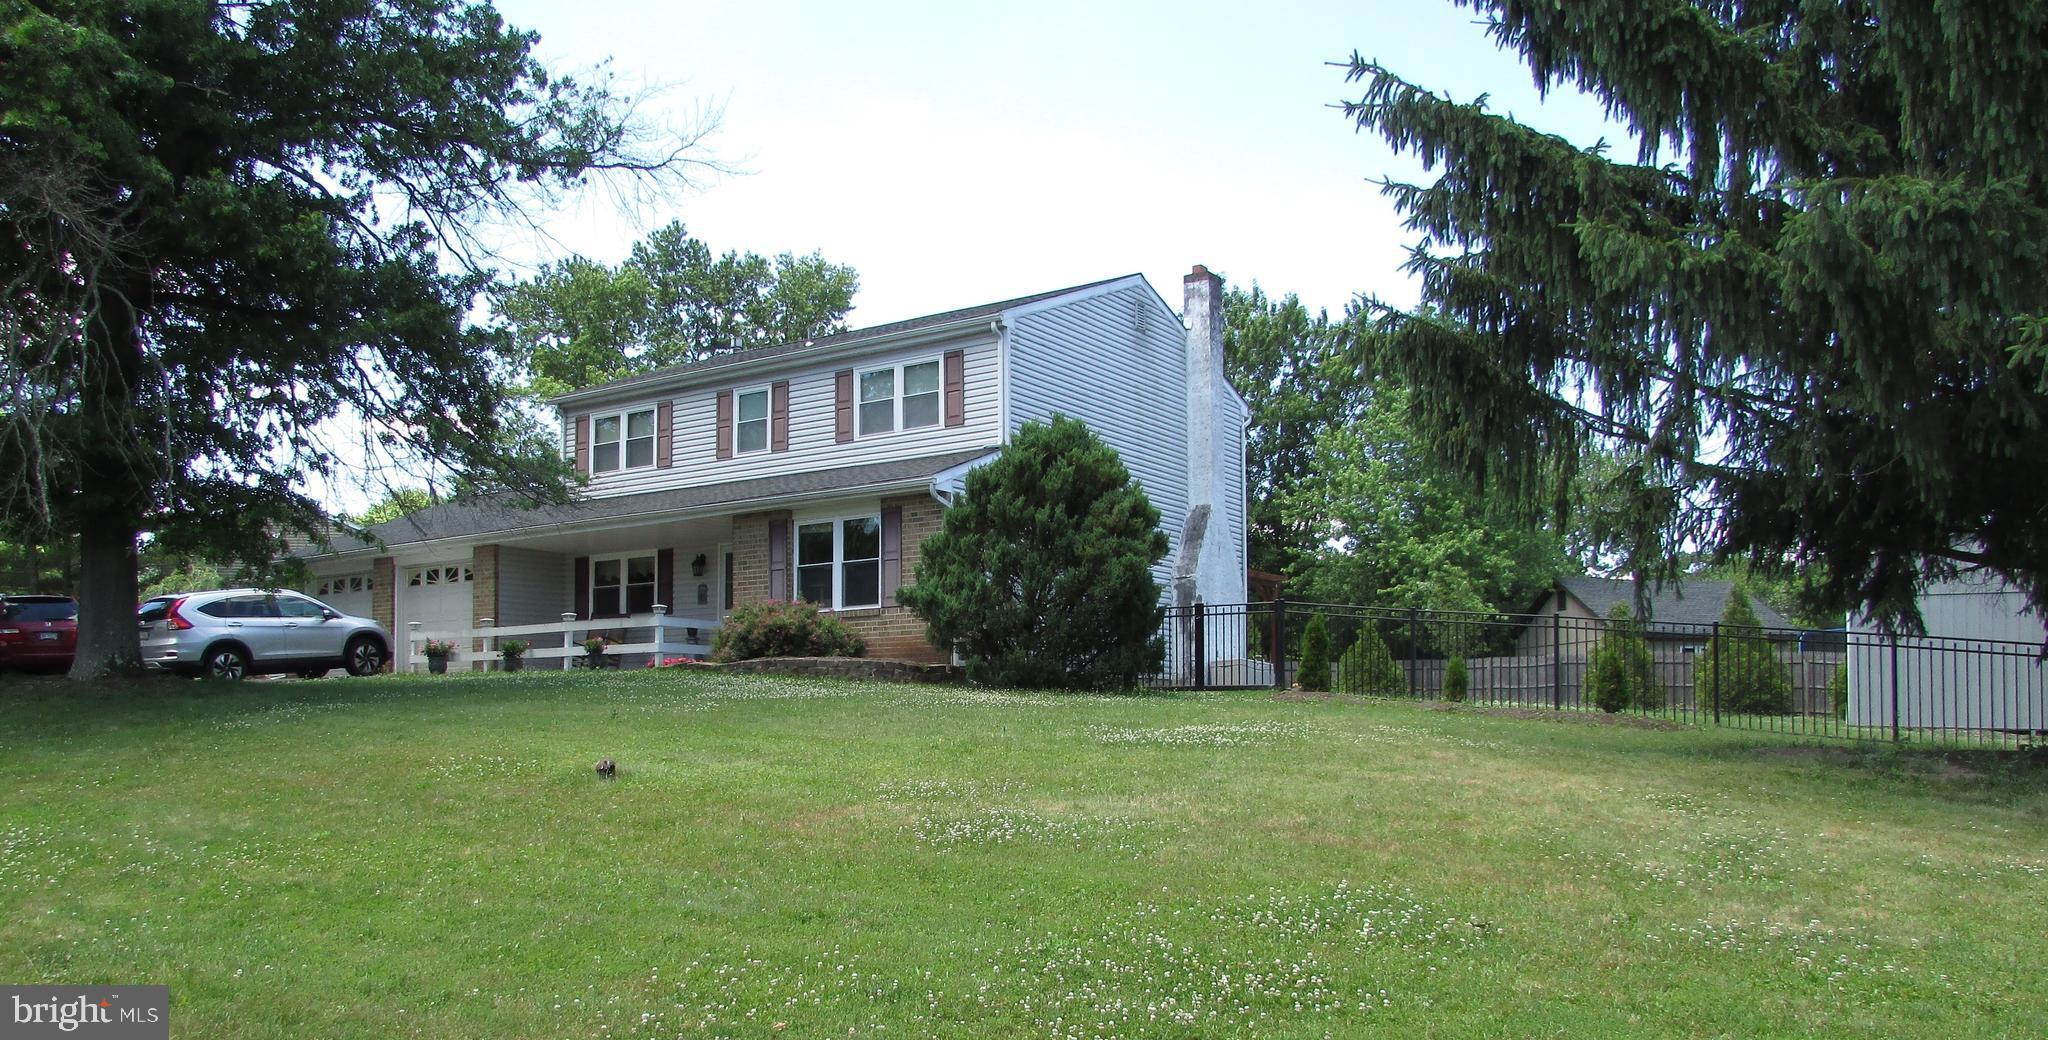 2287 Rebecca Drive, Hatfield, PA 19440